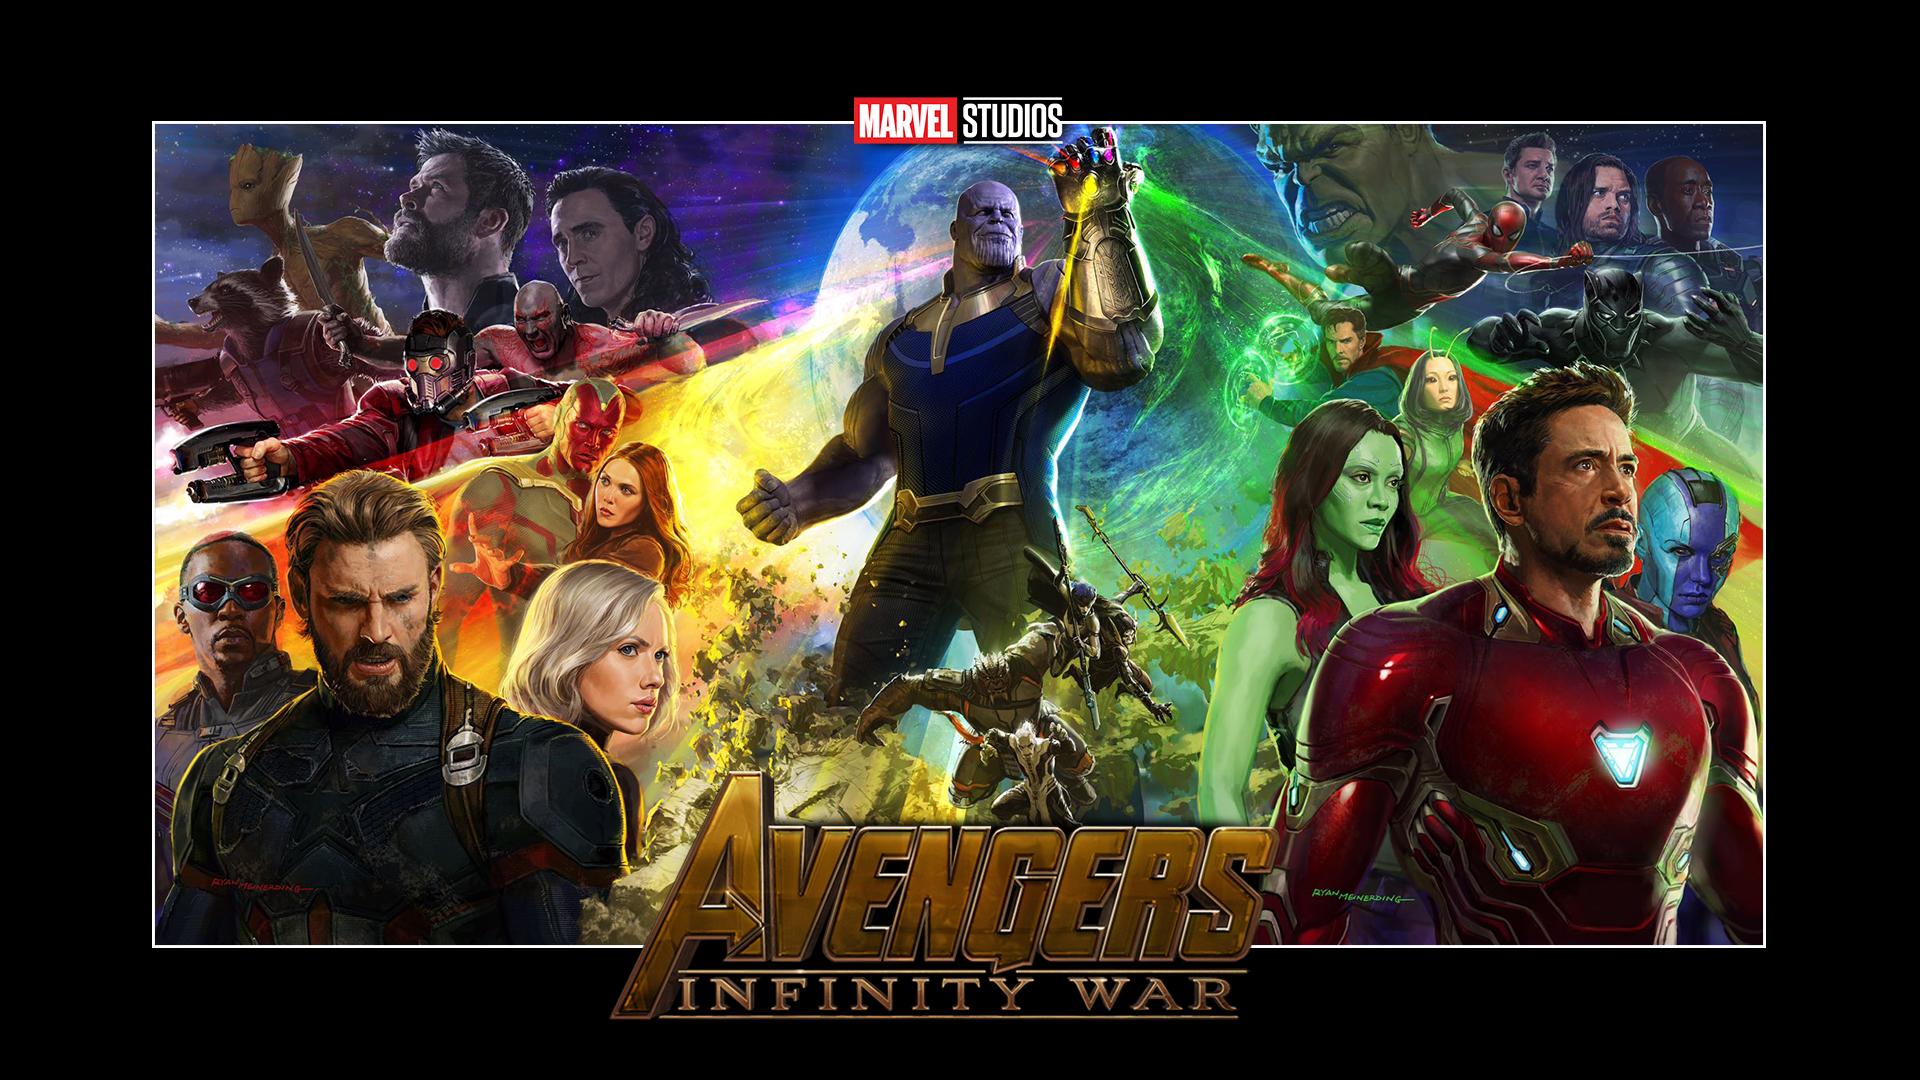 Infinity war movie poster